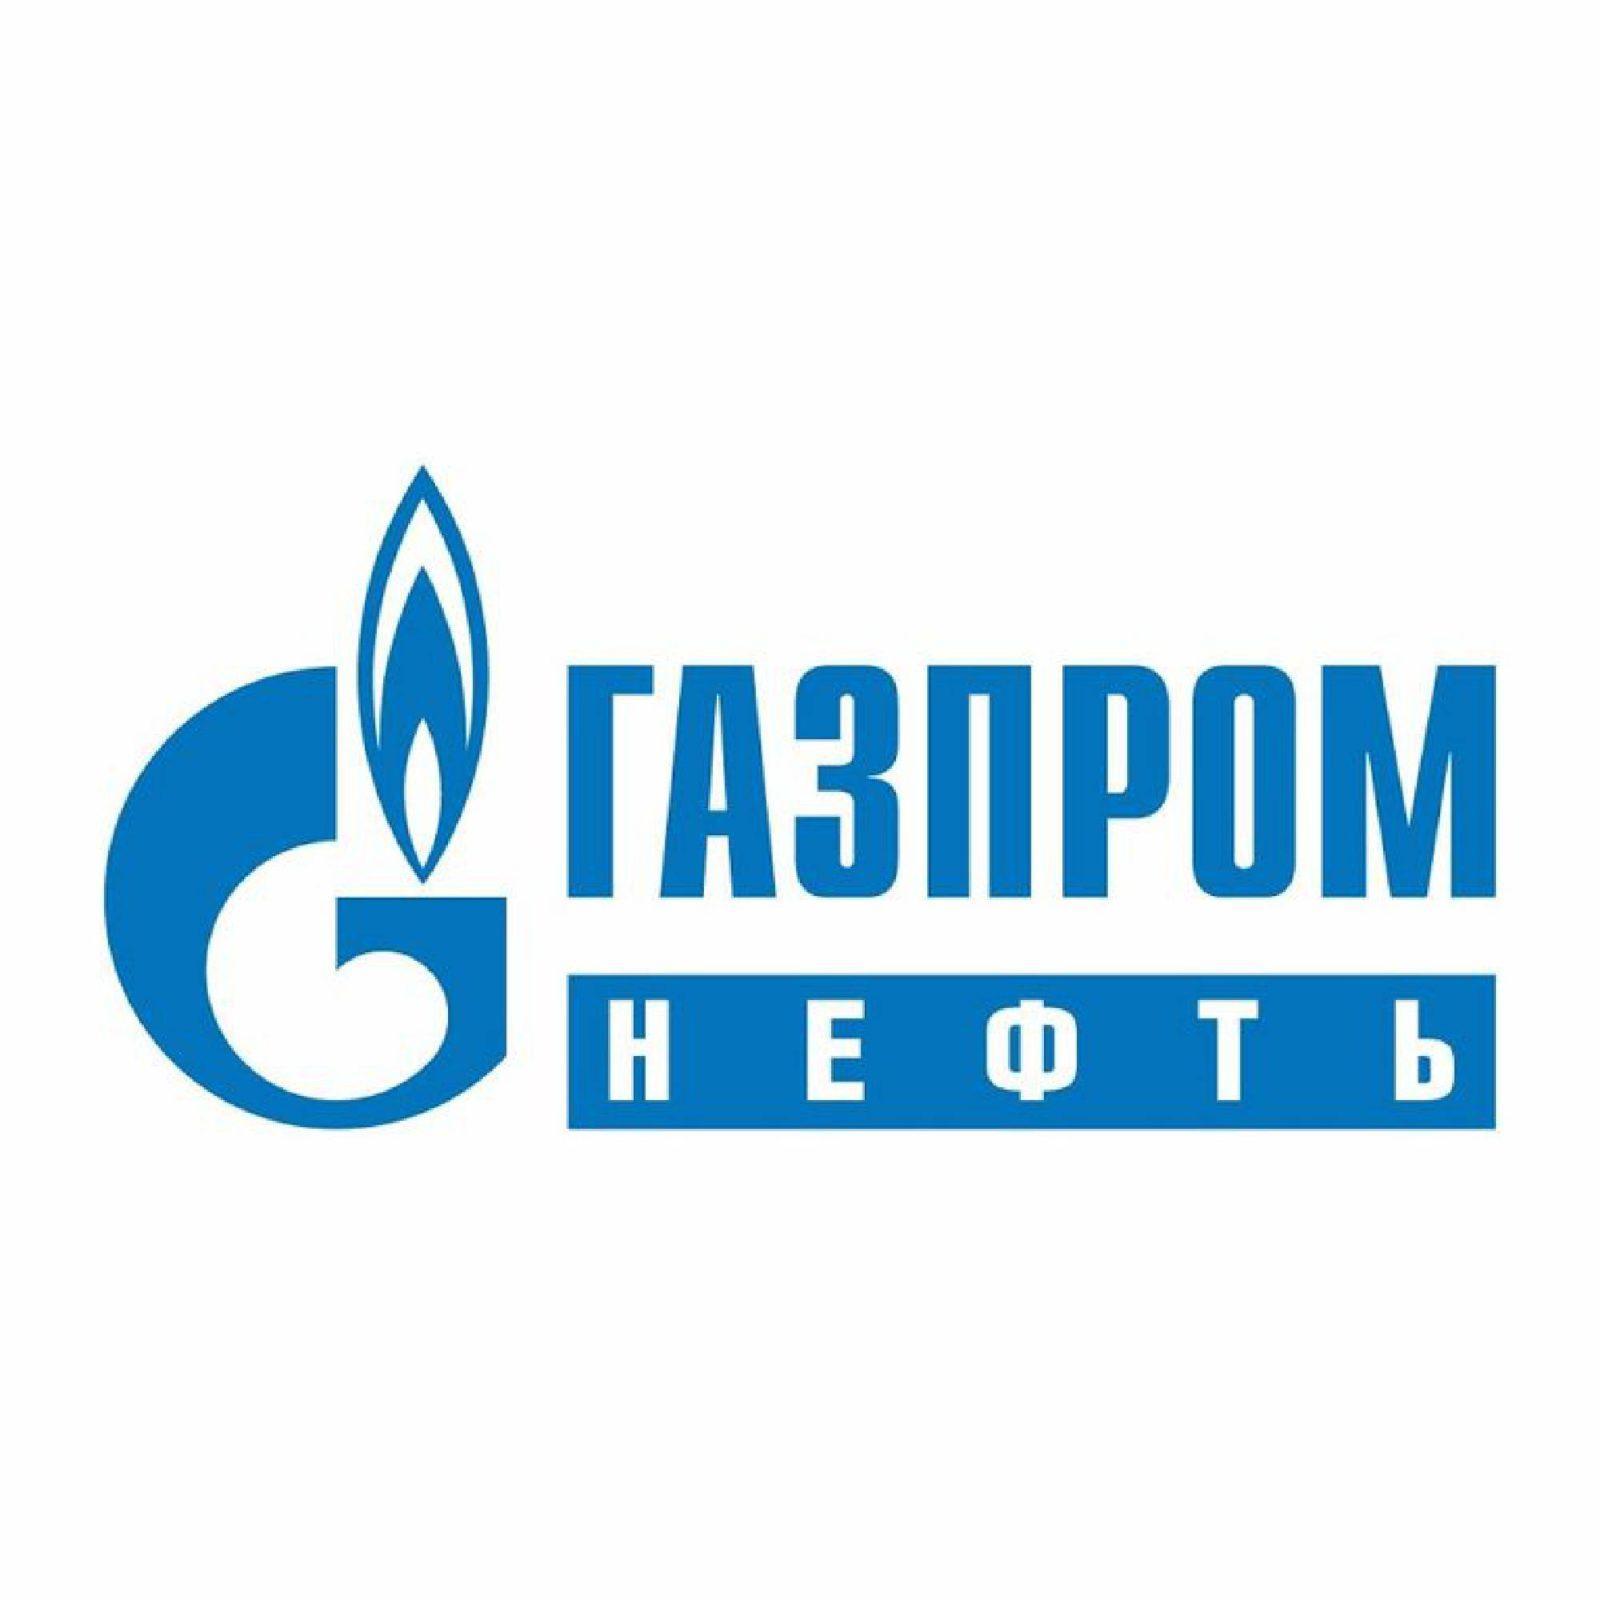 gaz-prom-neft2-1-2000x2000.jpg